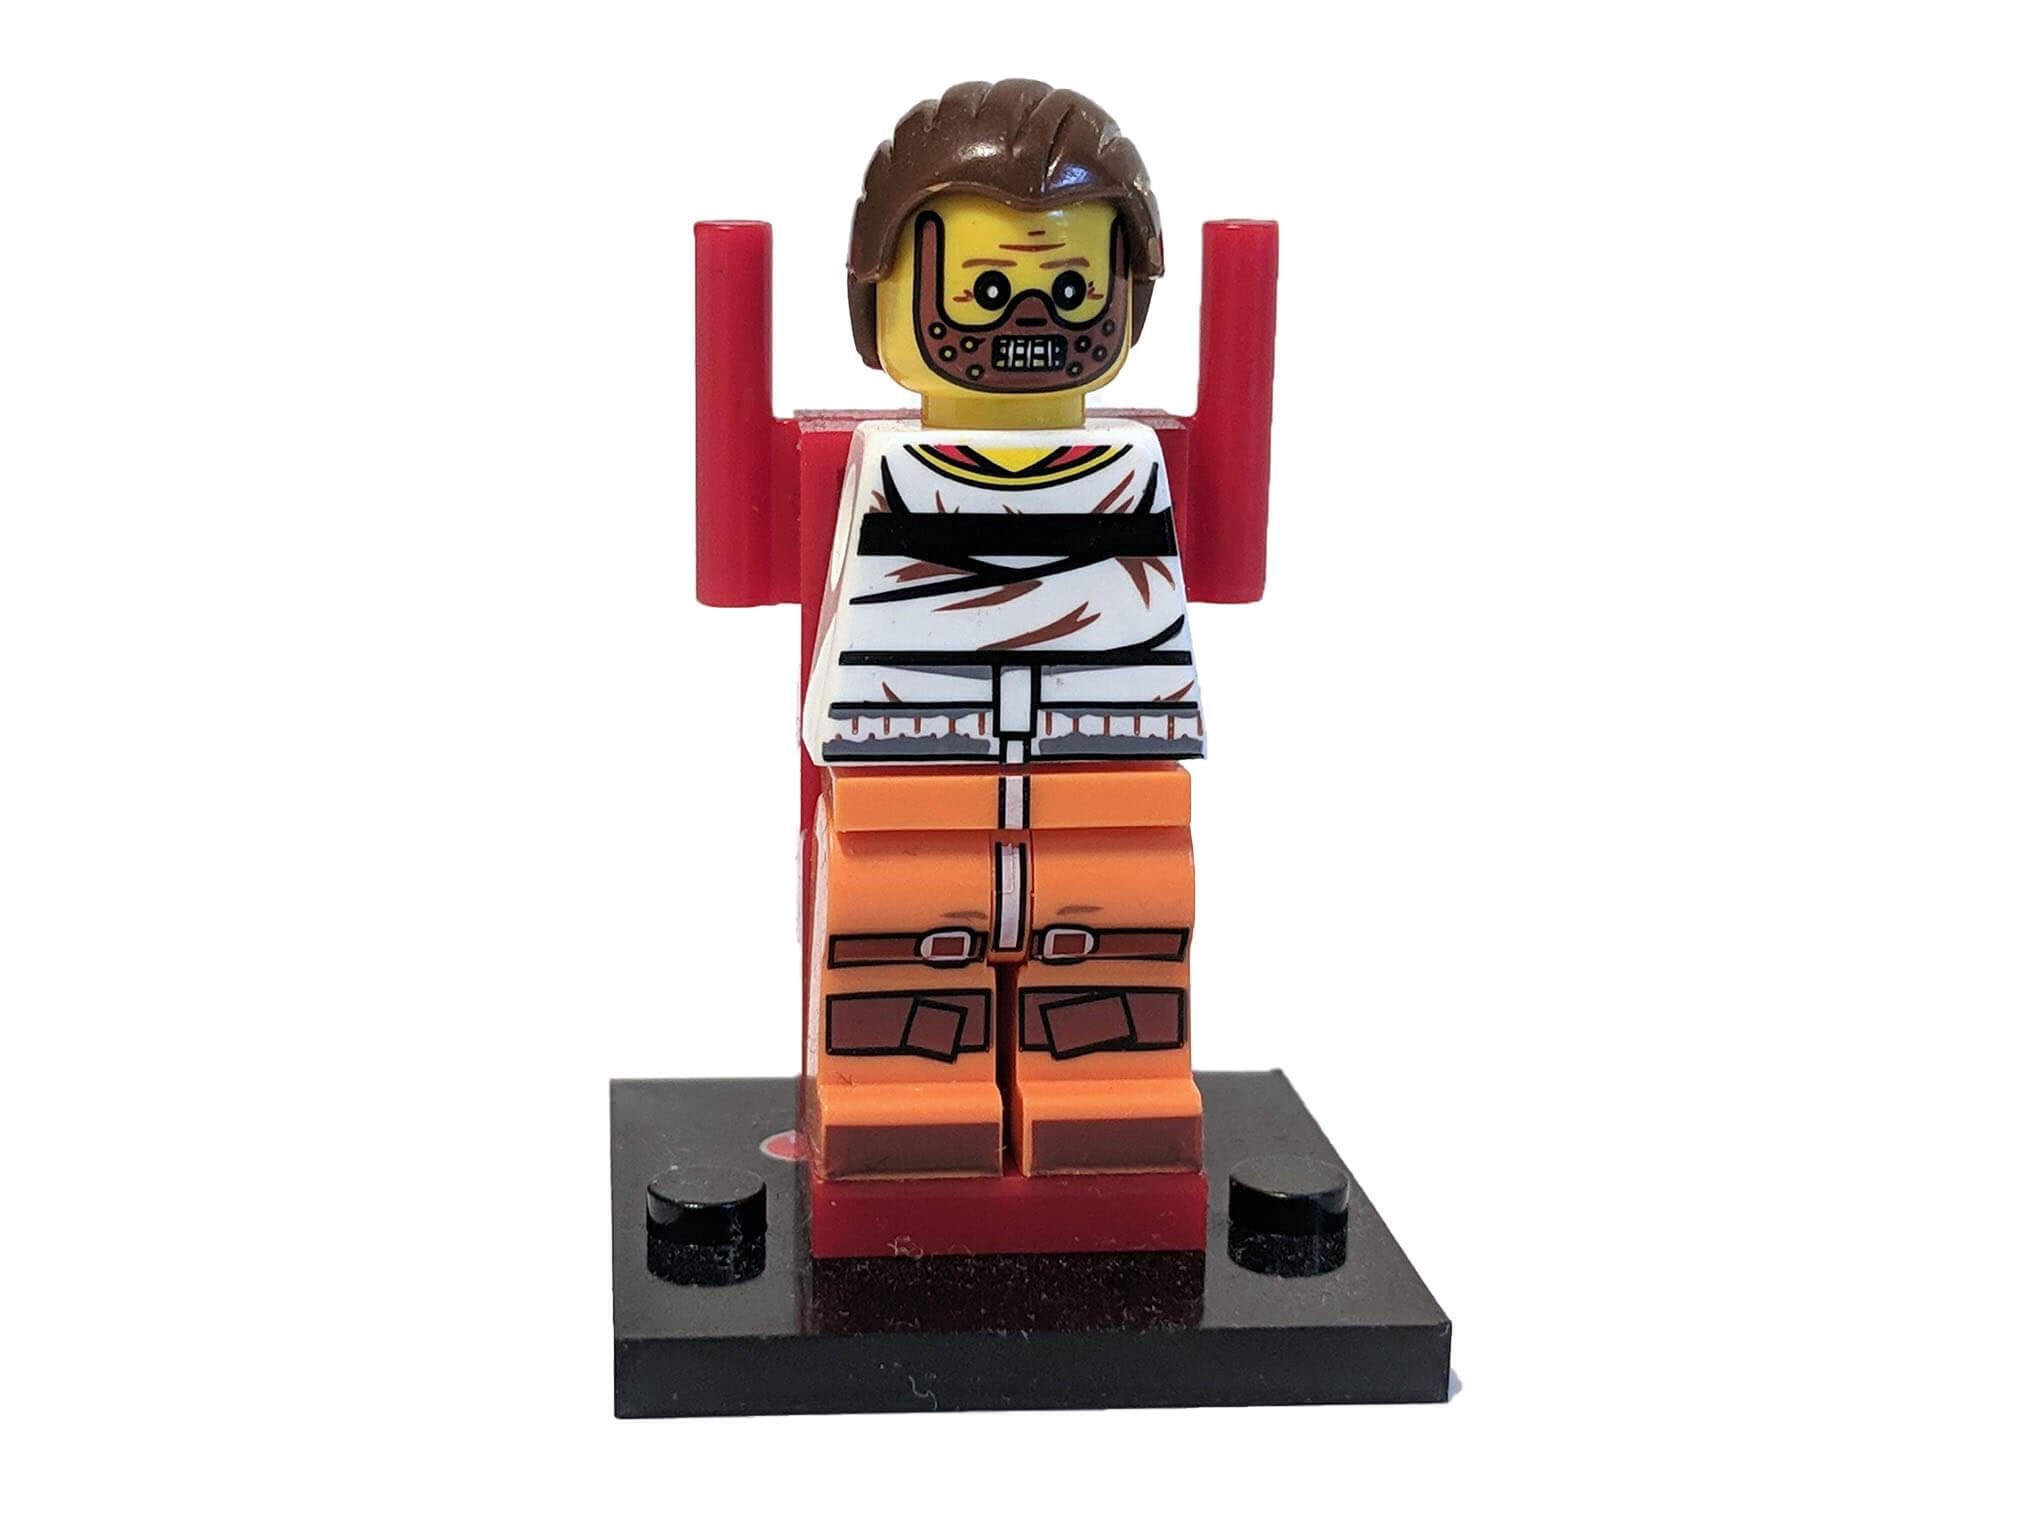 LEGO-Hannibal-Lecter.jpg